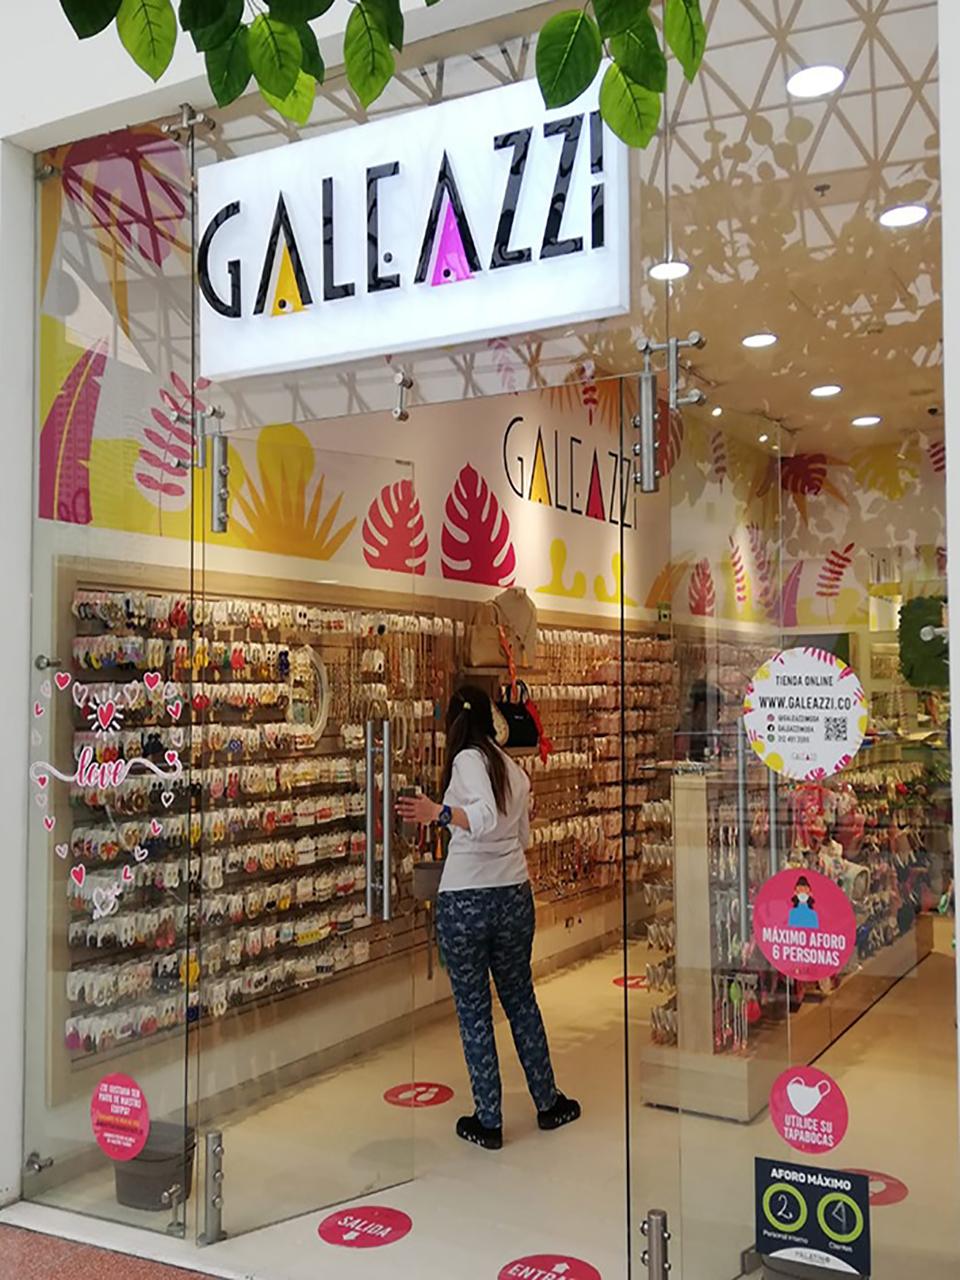 Galeazzi